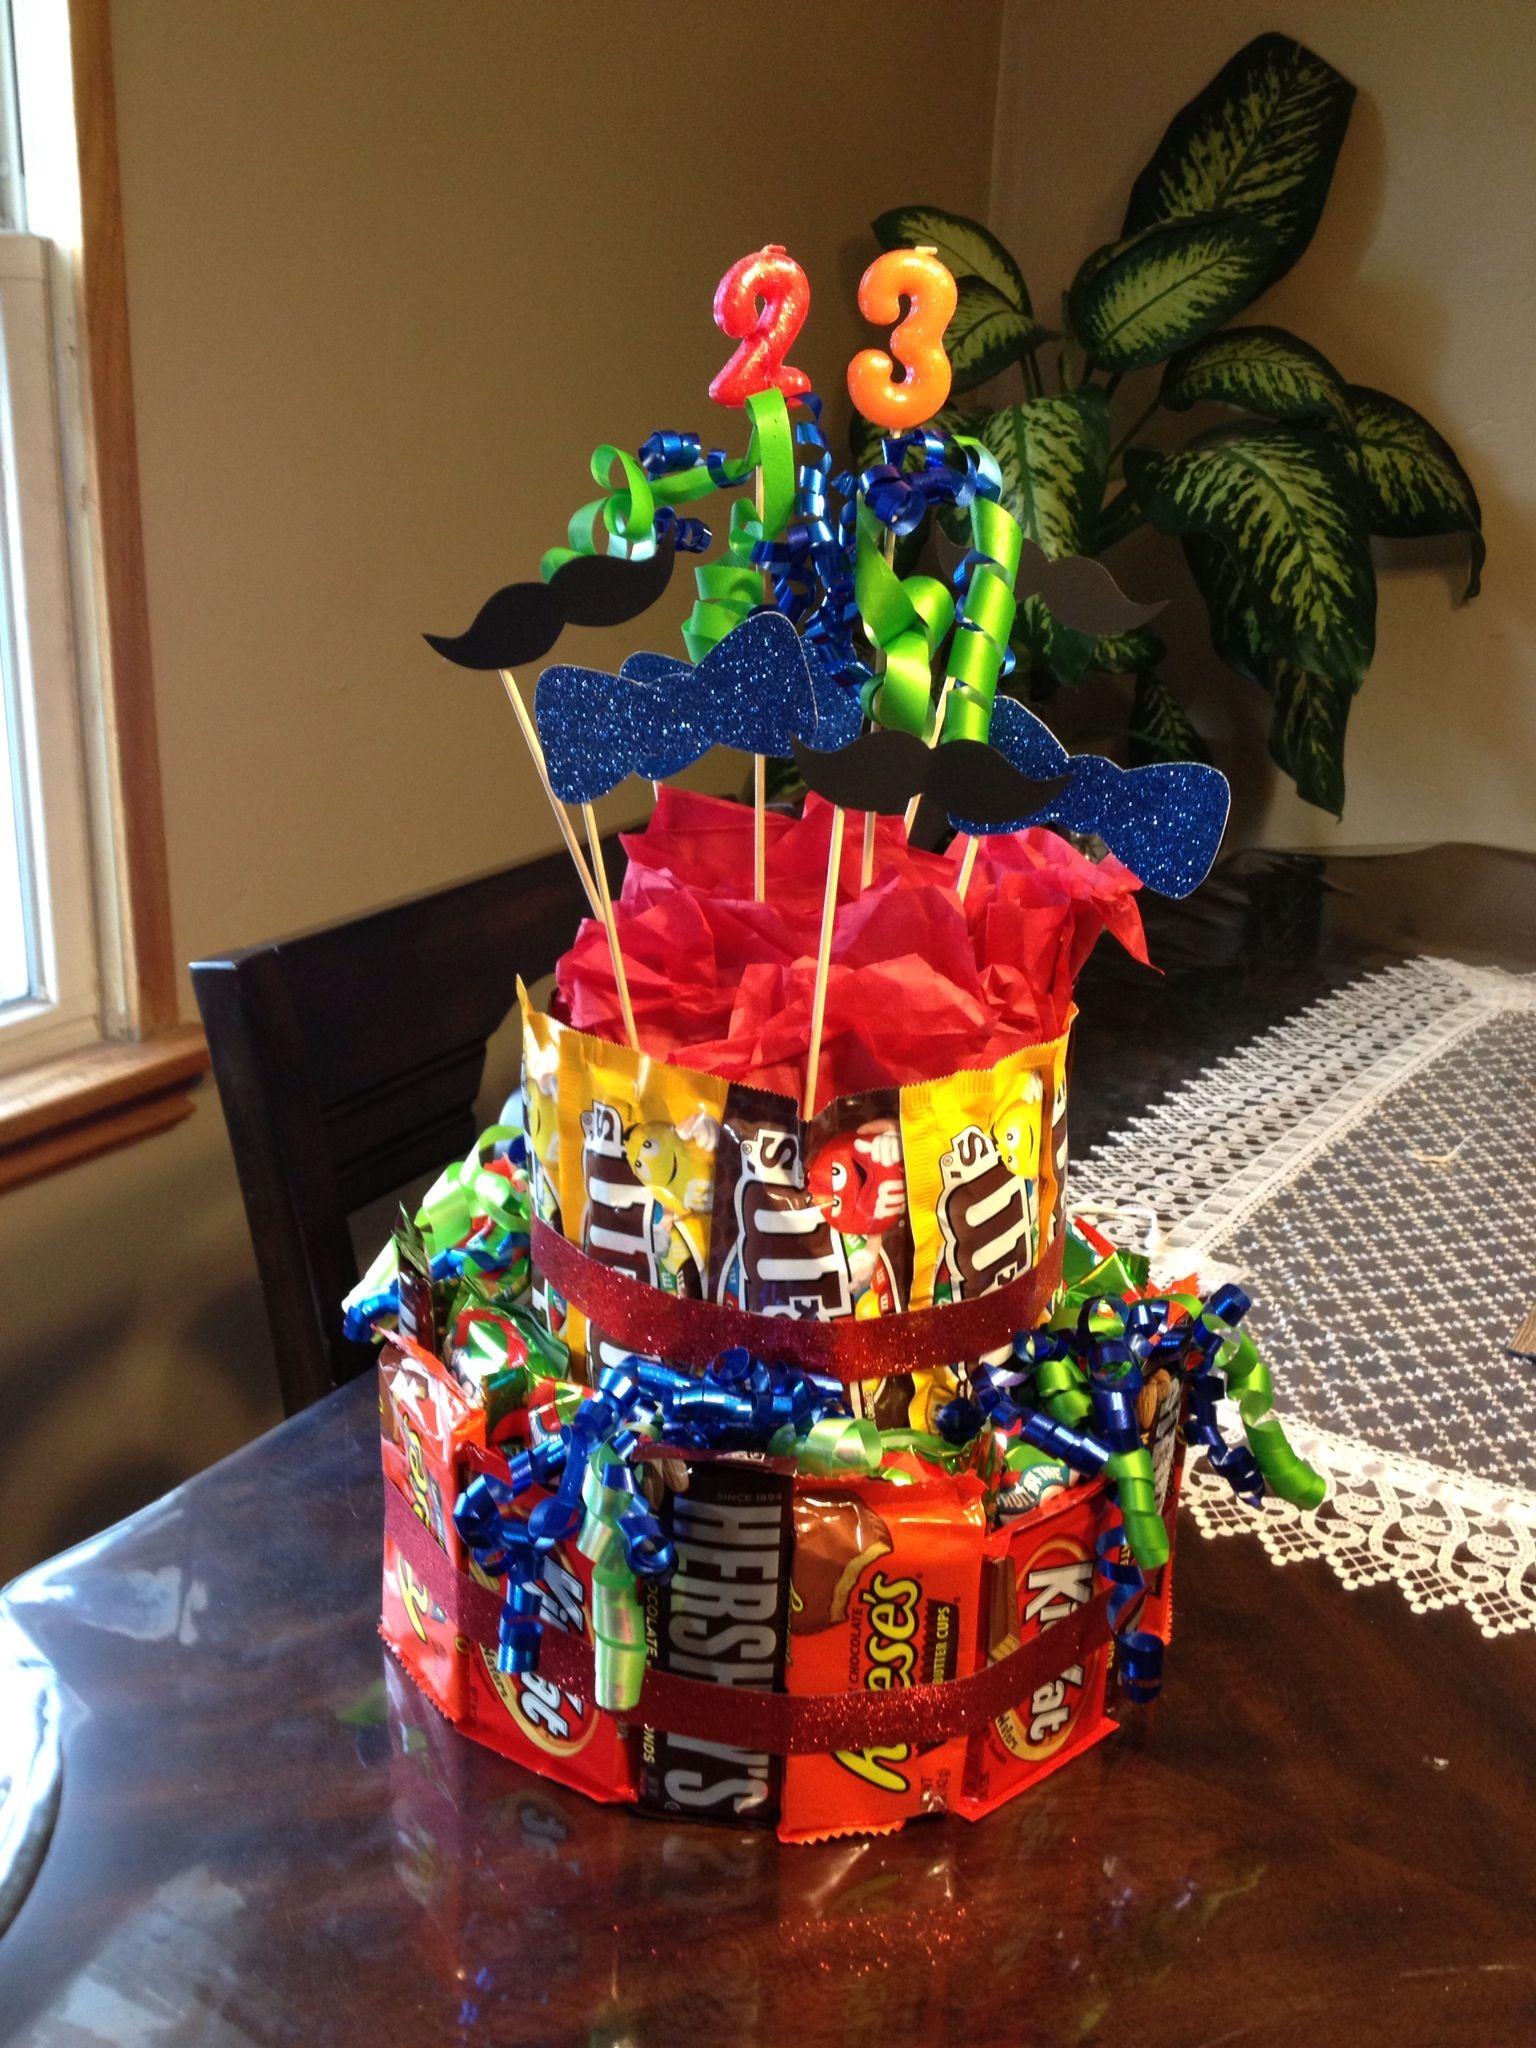 Birthday Party Ideas: Birthday Party Ideas For Boyfriend's